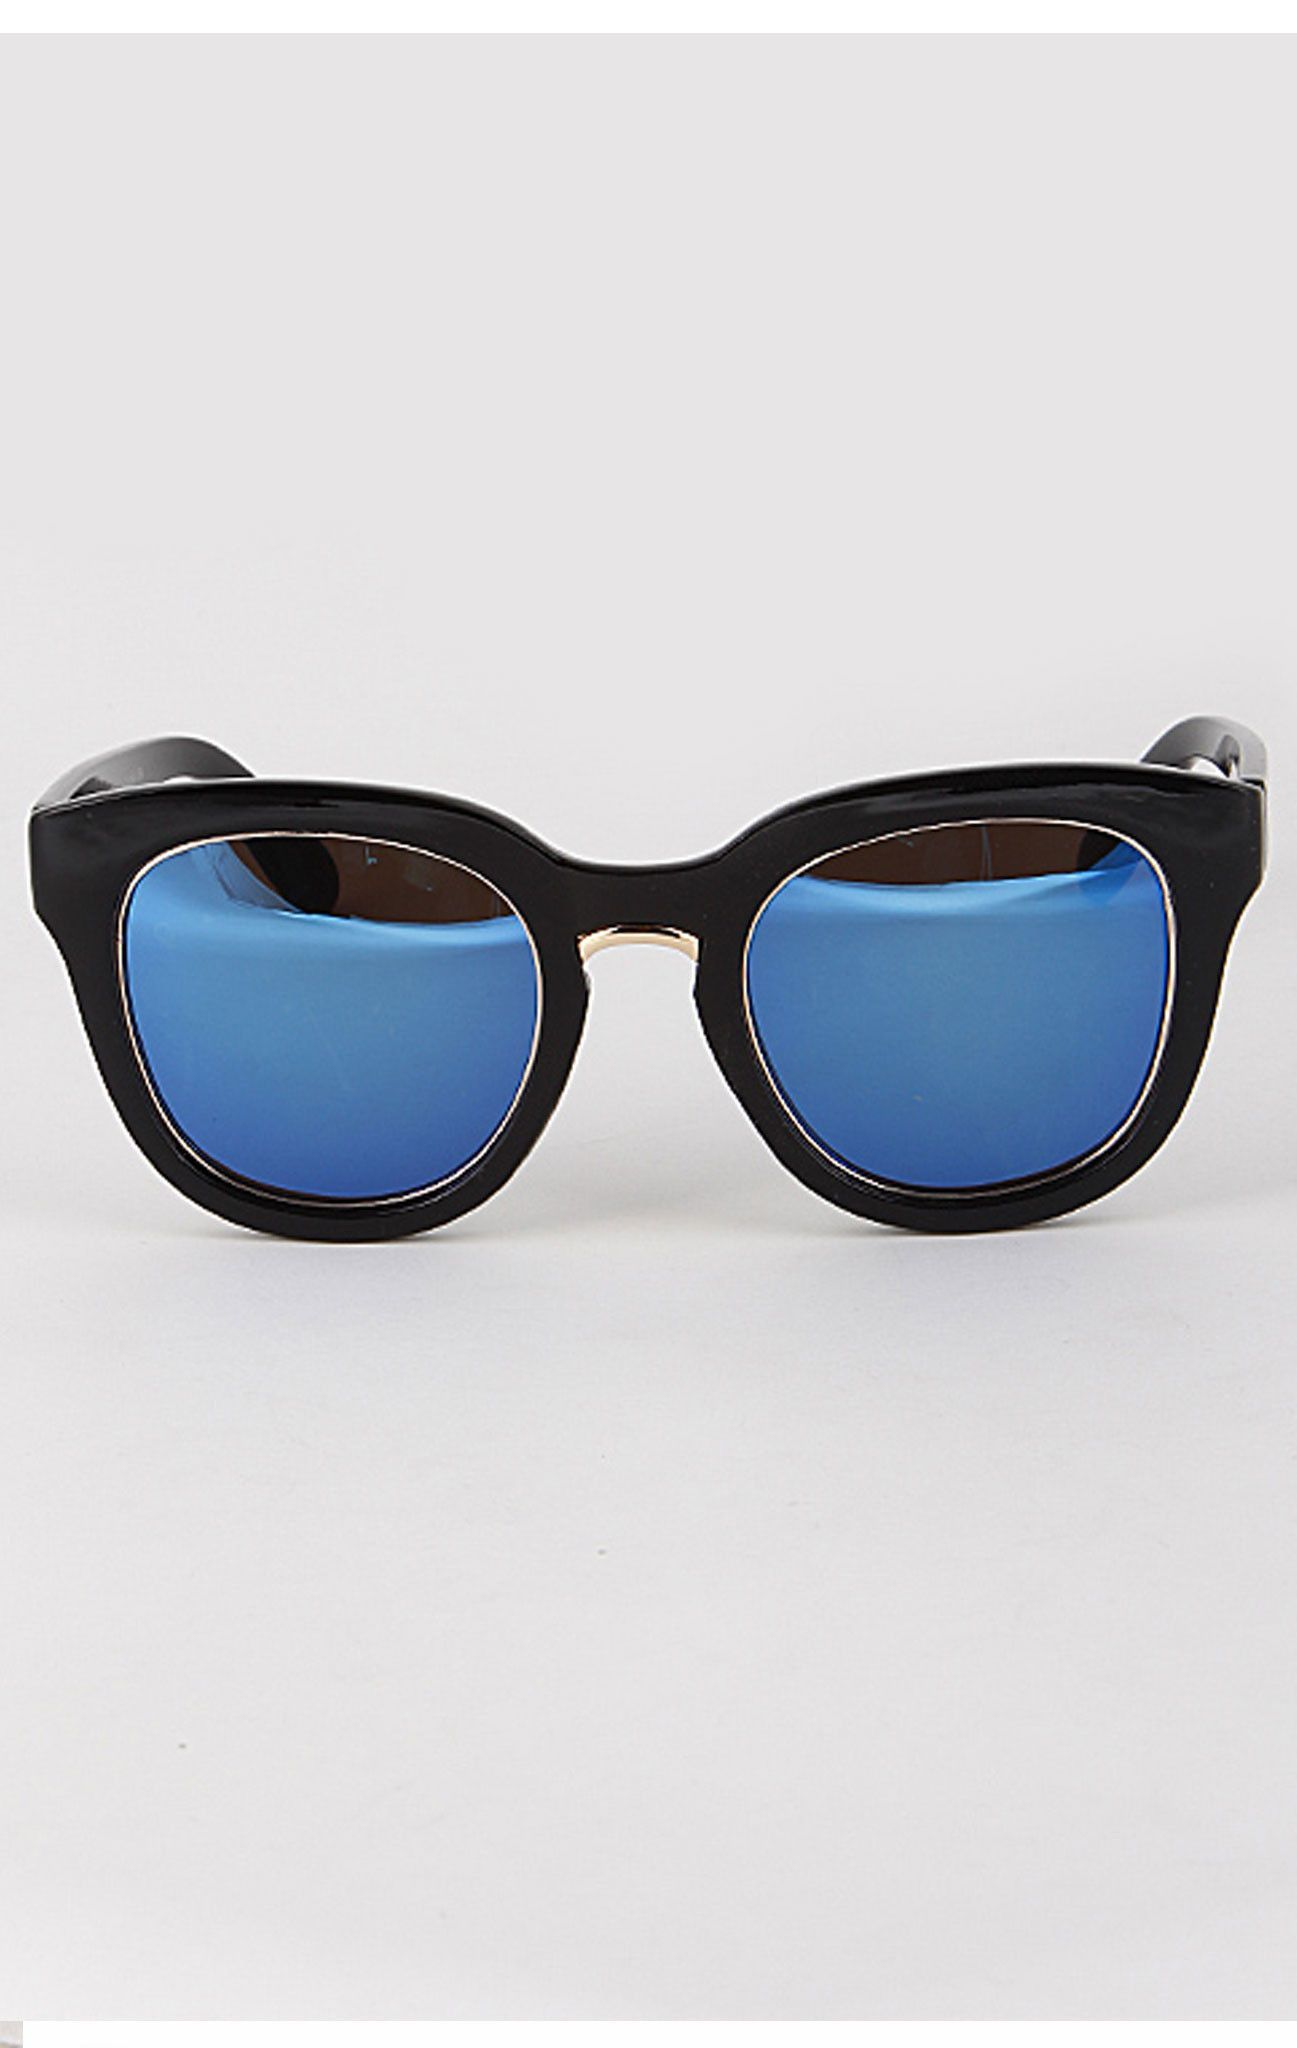 Funky Square Summer Sunglasses